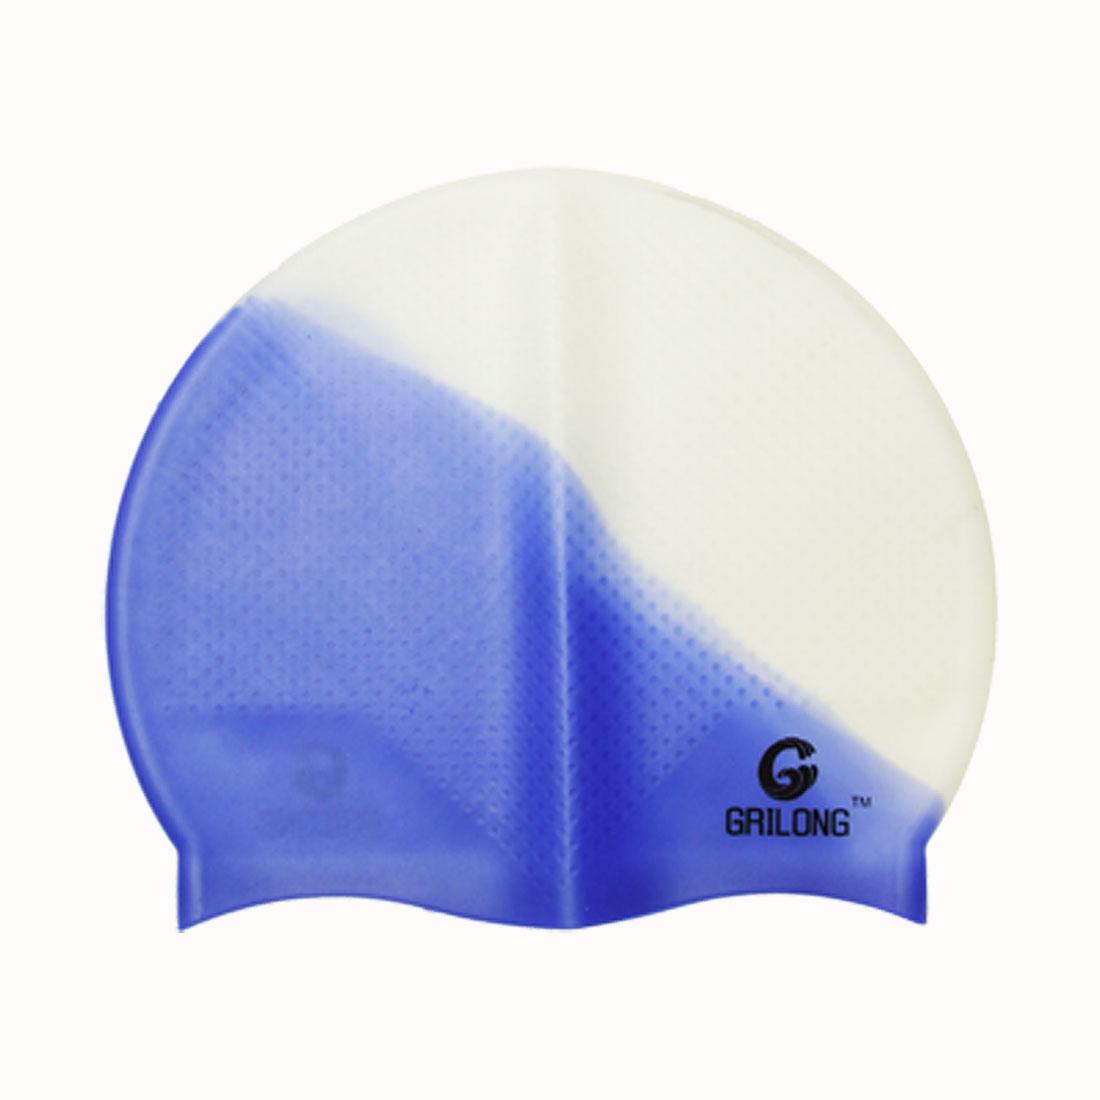 Anti-Slip Durable Silicone Swimming Hat Cap Blue White